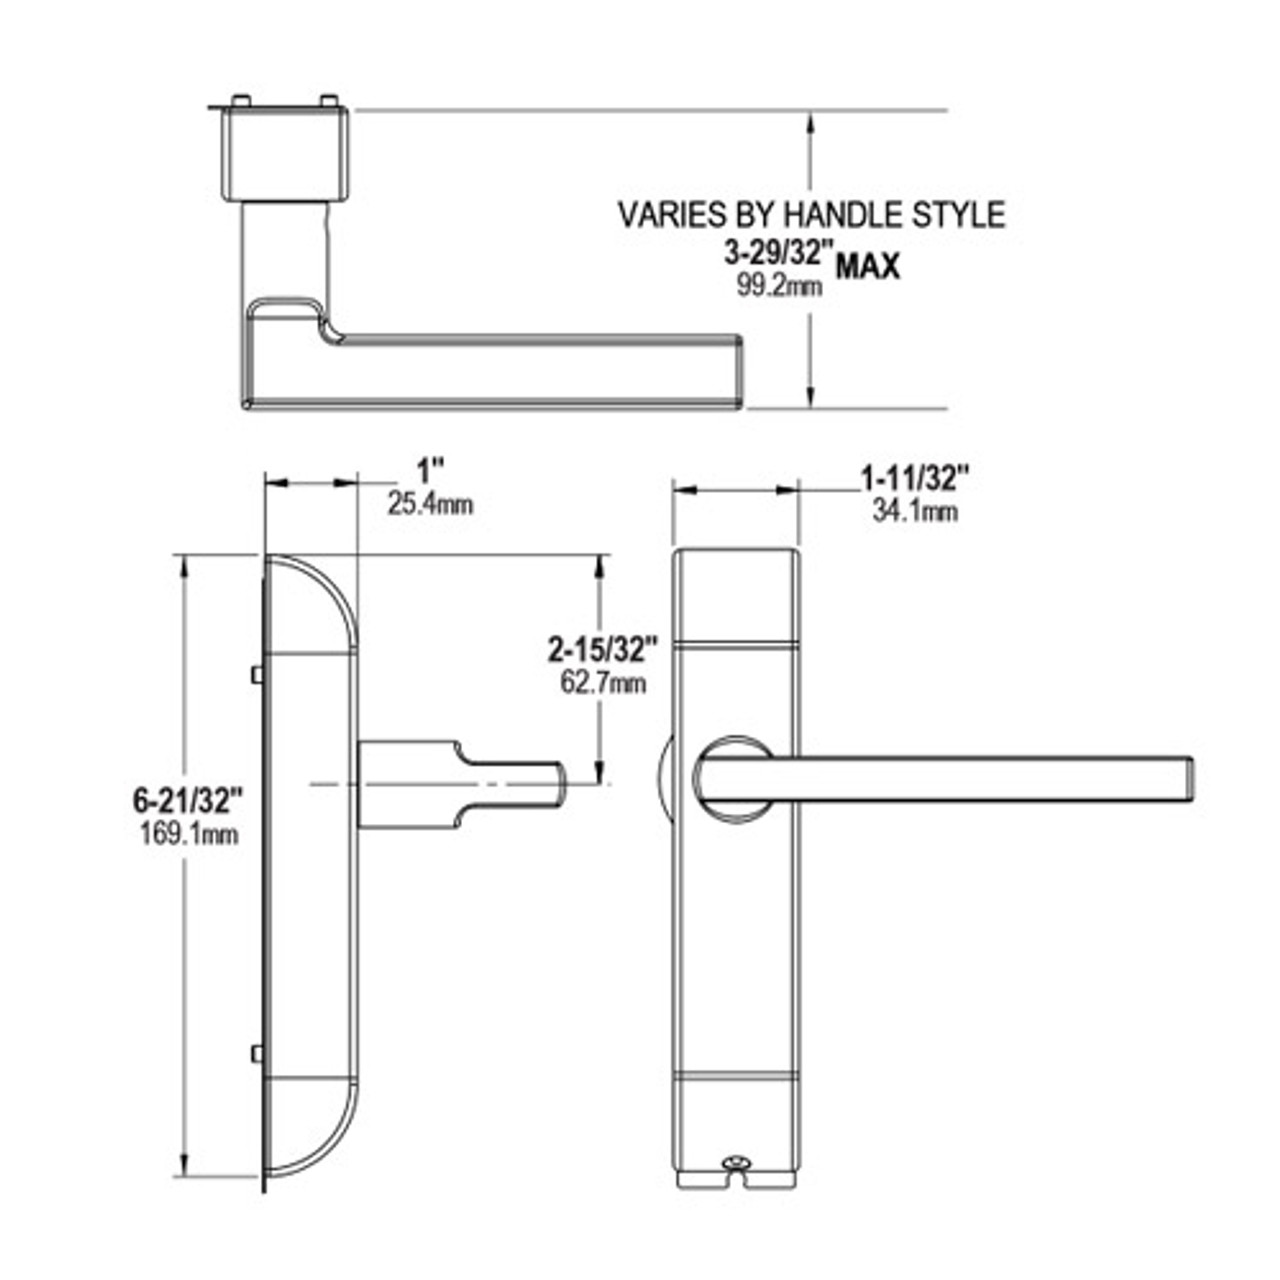 4600M-MV-652-US32D Adams Rite MV Designer handle Dimensional View